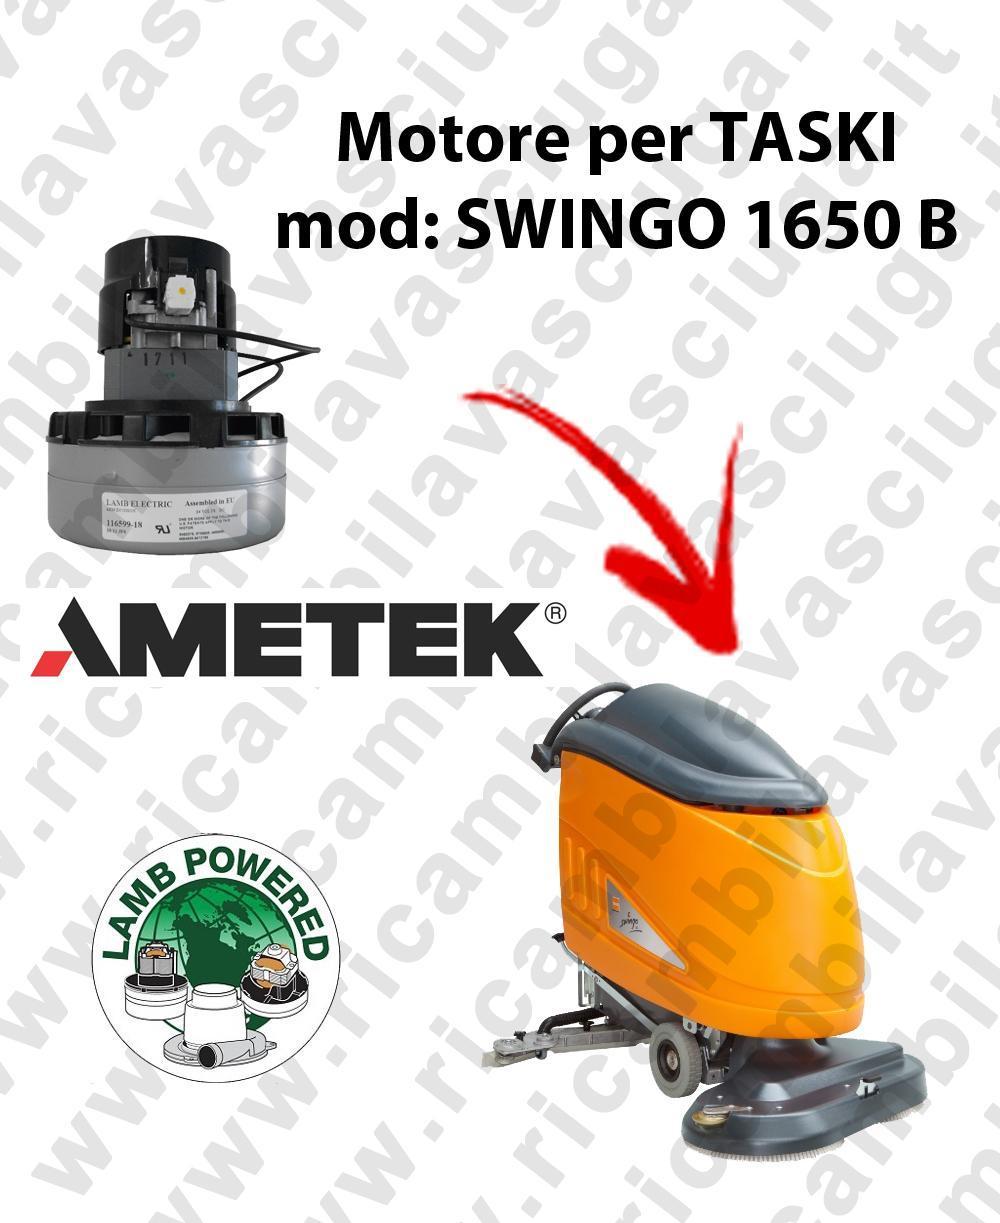 SWINGO 1650 B MOTEUR ASPIRATION LAMB AMATEK pour autolaveuses TASKI